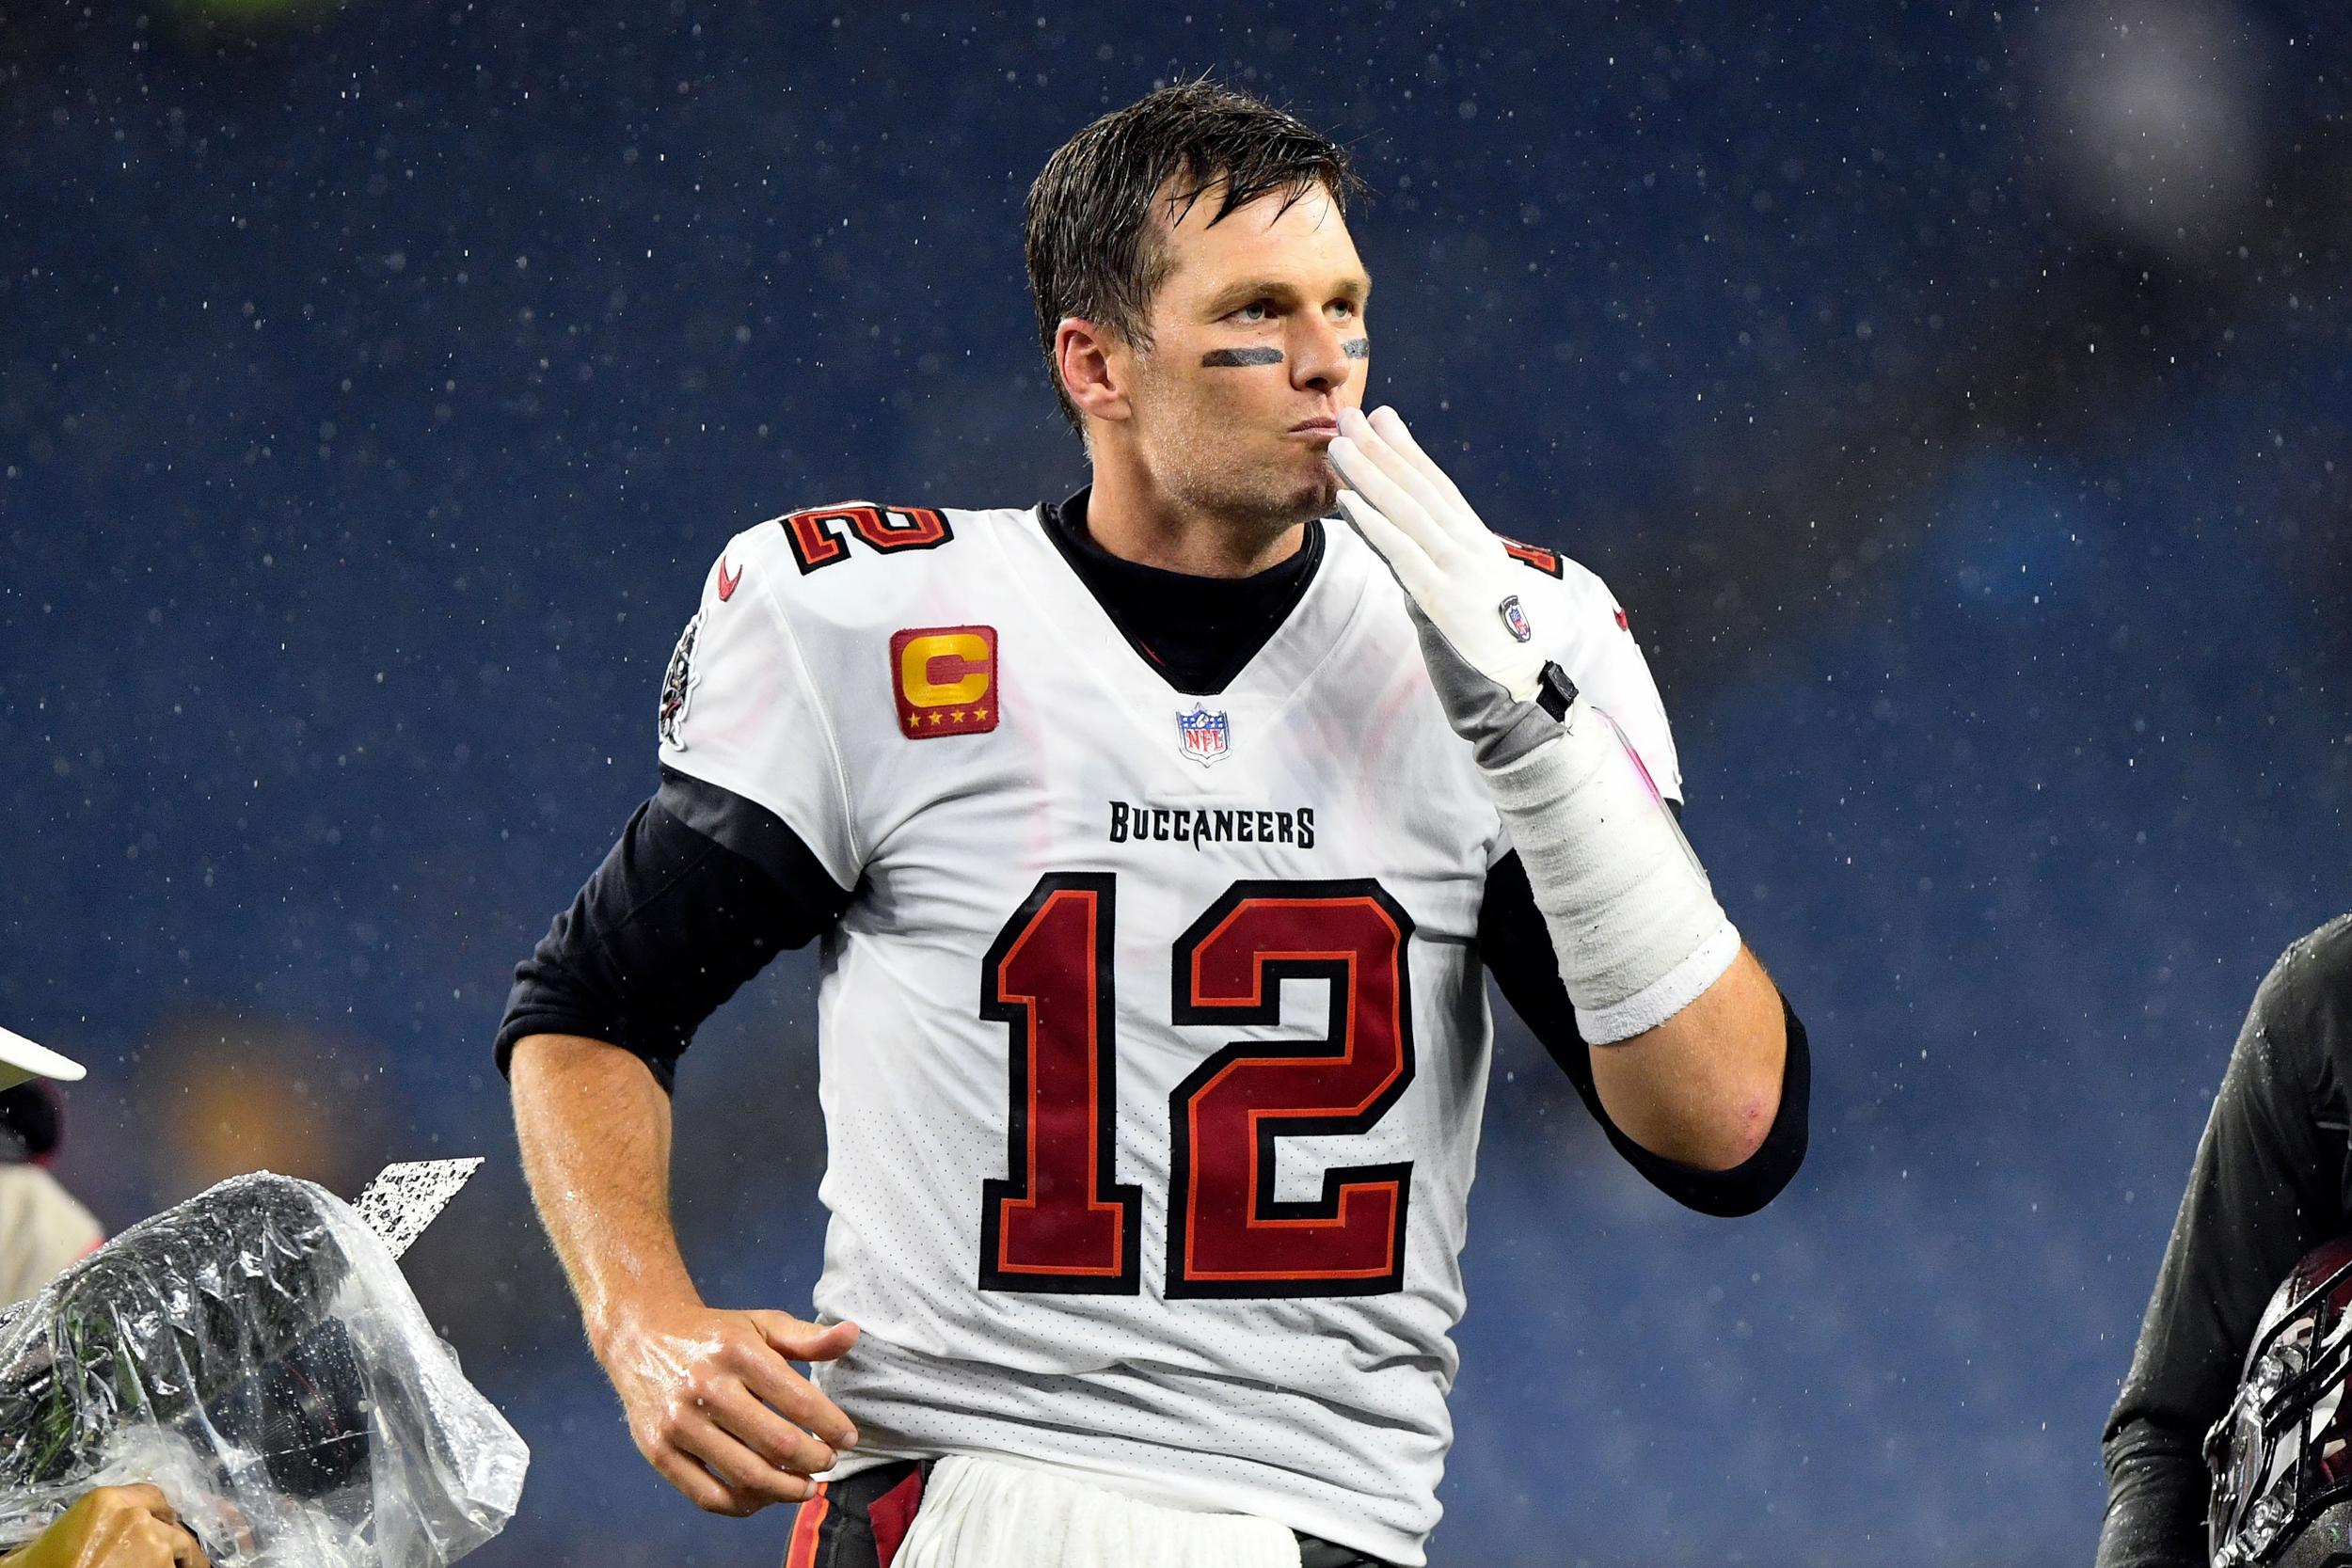 Bucs hold on to win Tom Brady's New England homecoming